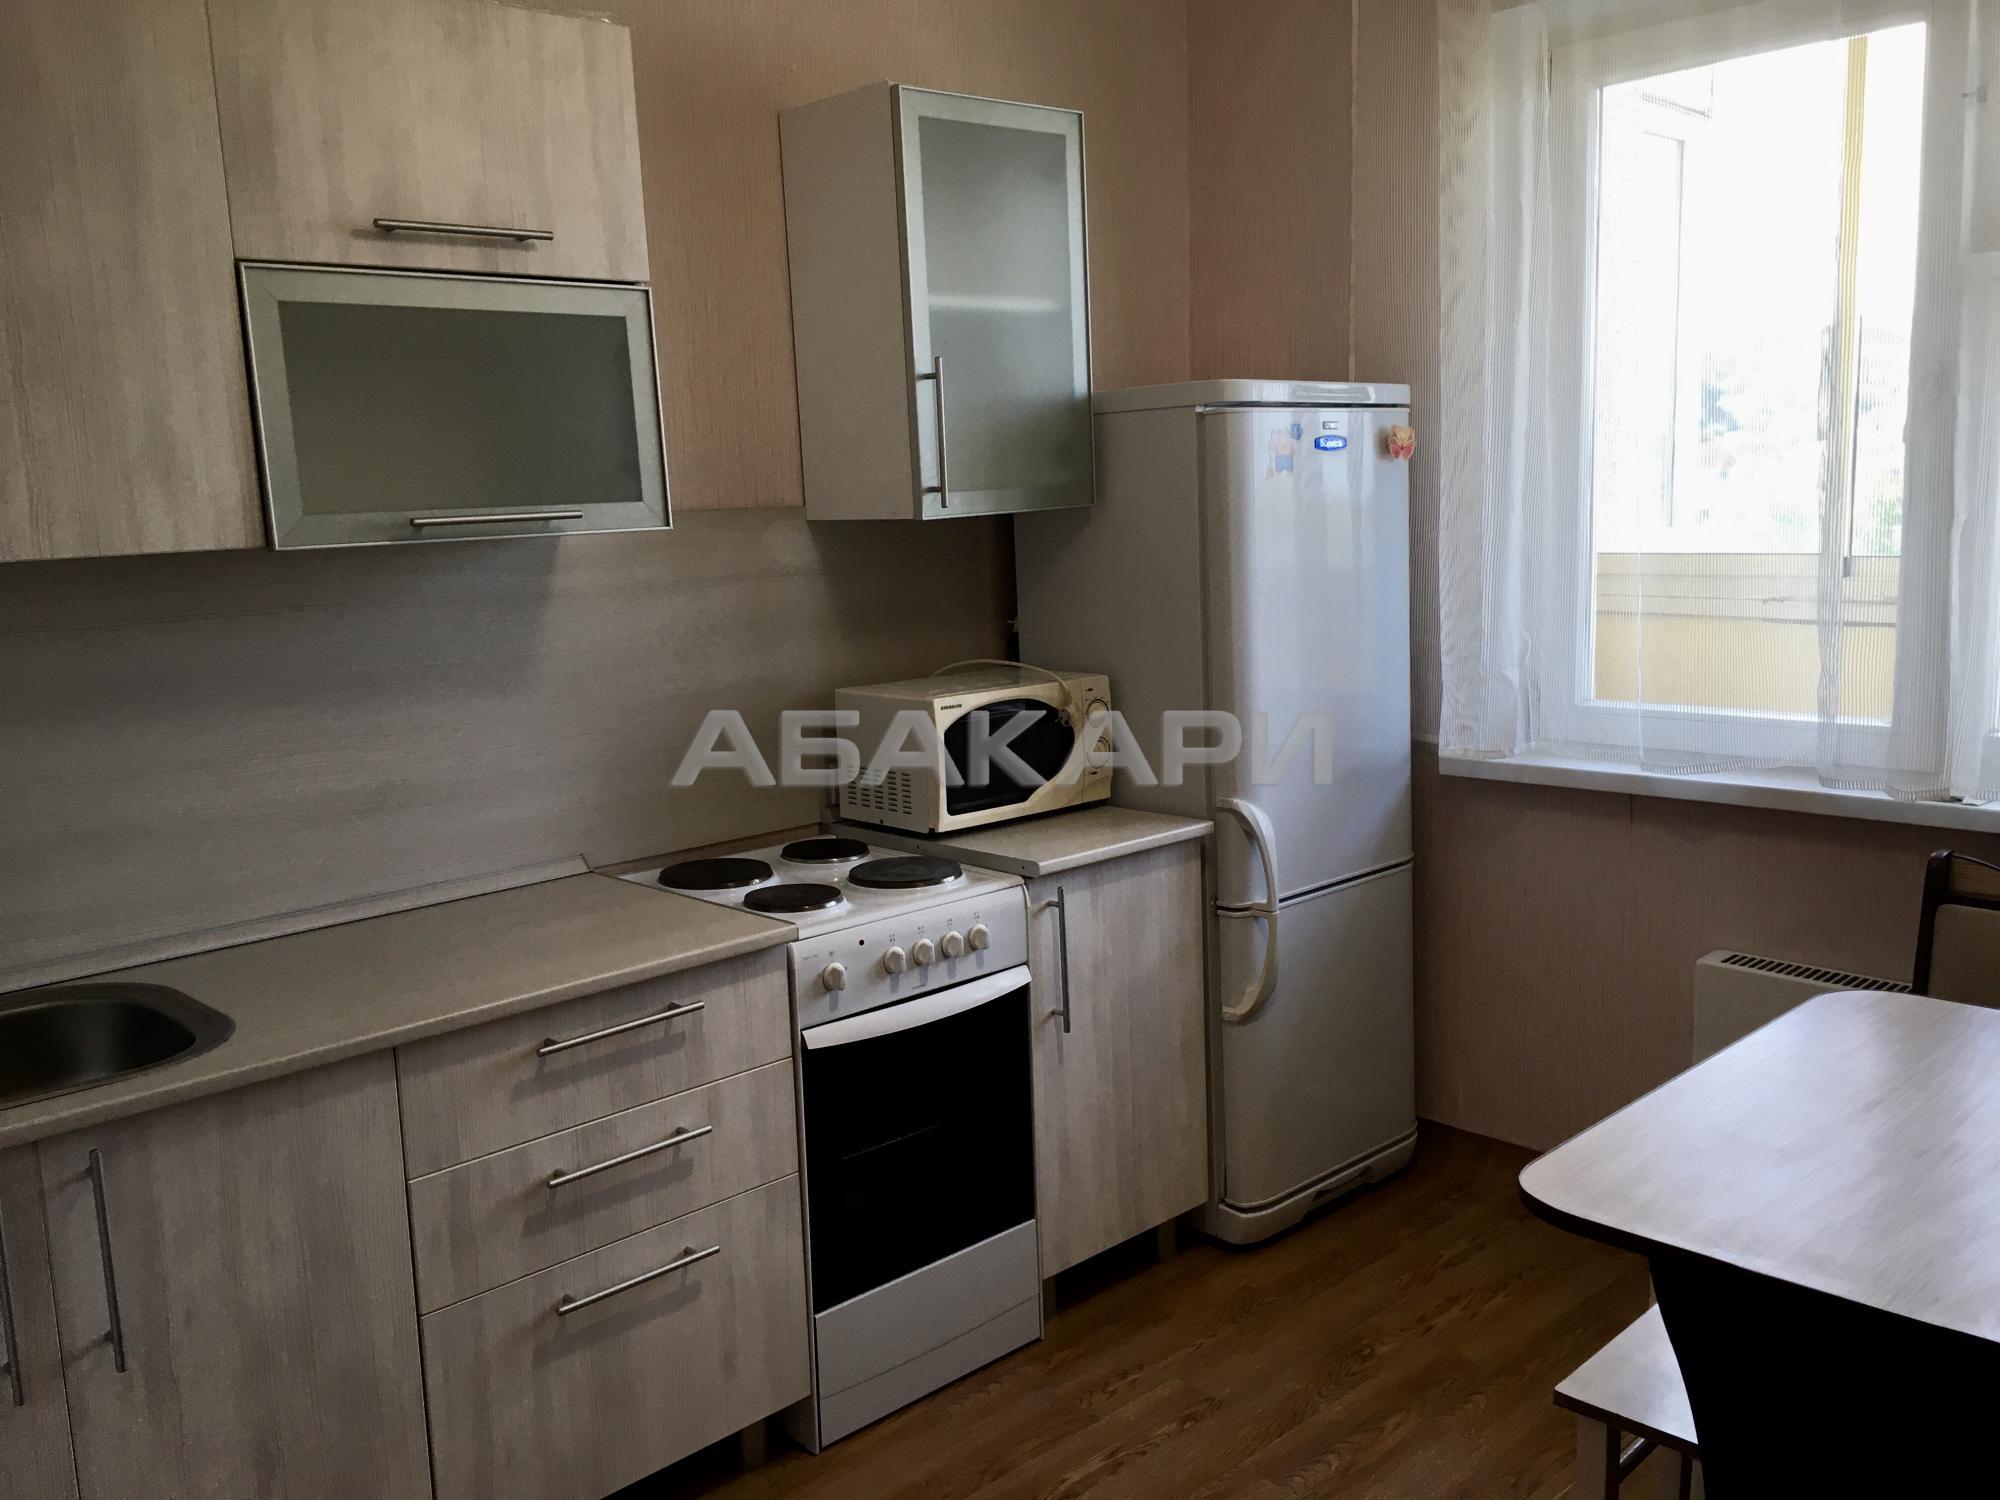 1к квартира Советская улица, 137 | 16000 | аренда в Красноярске фото 5